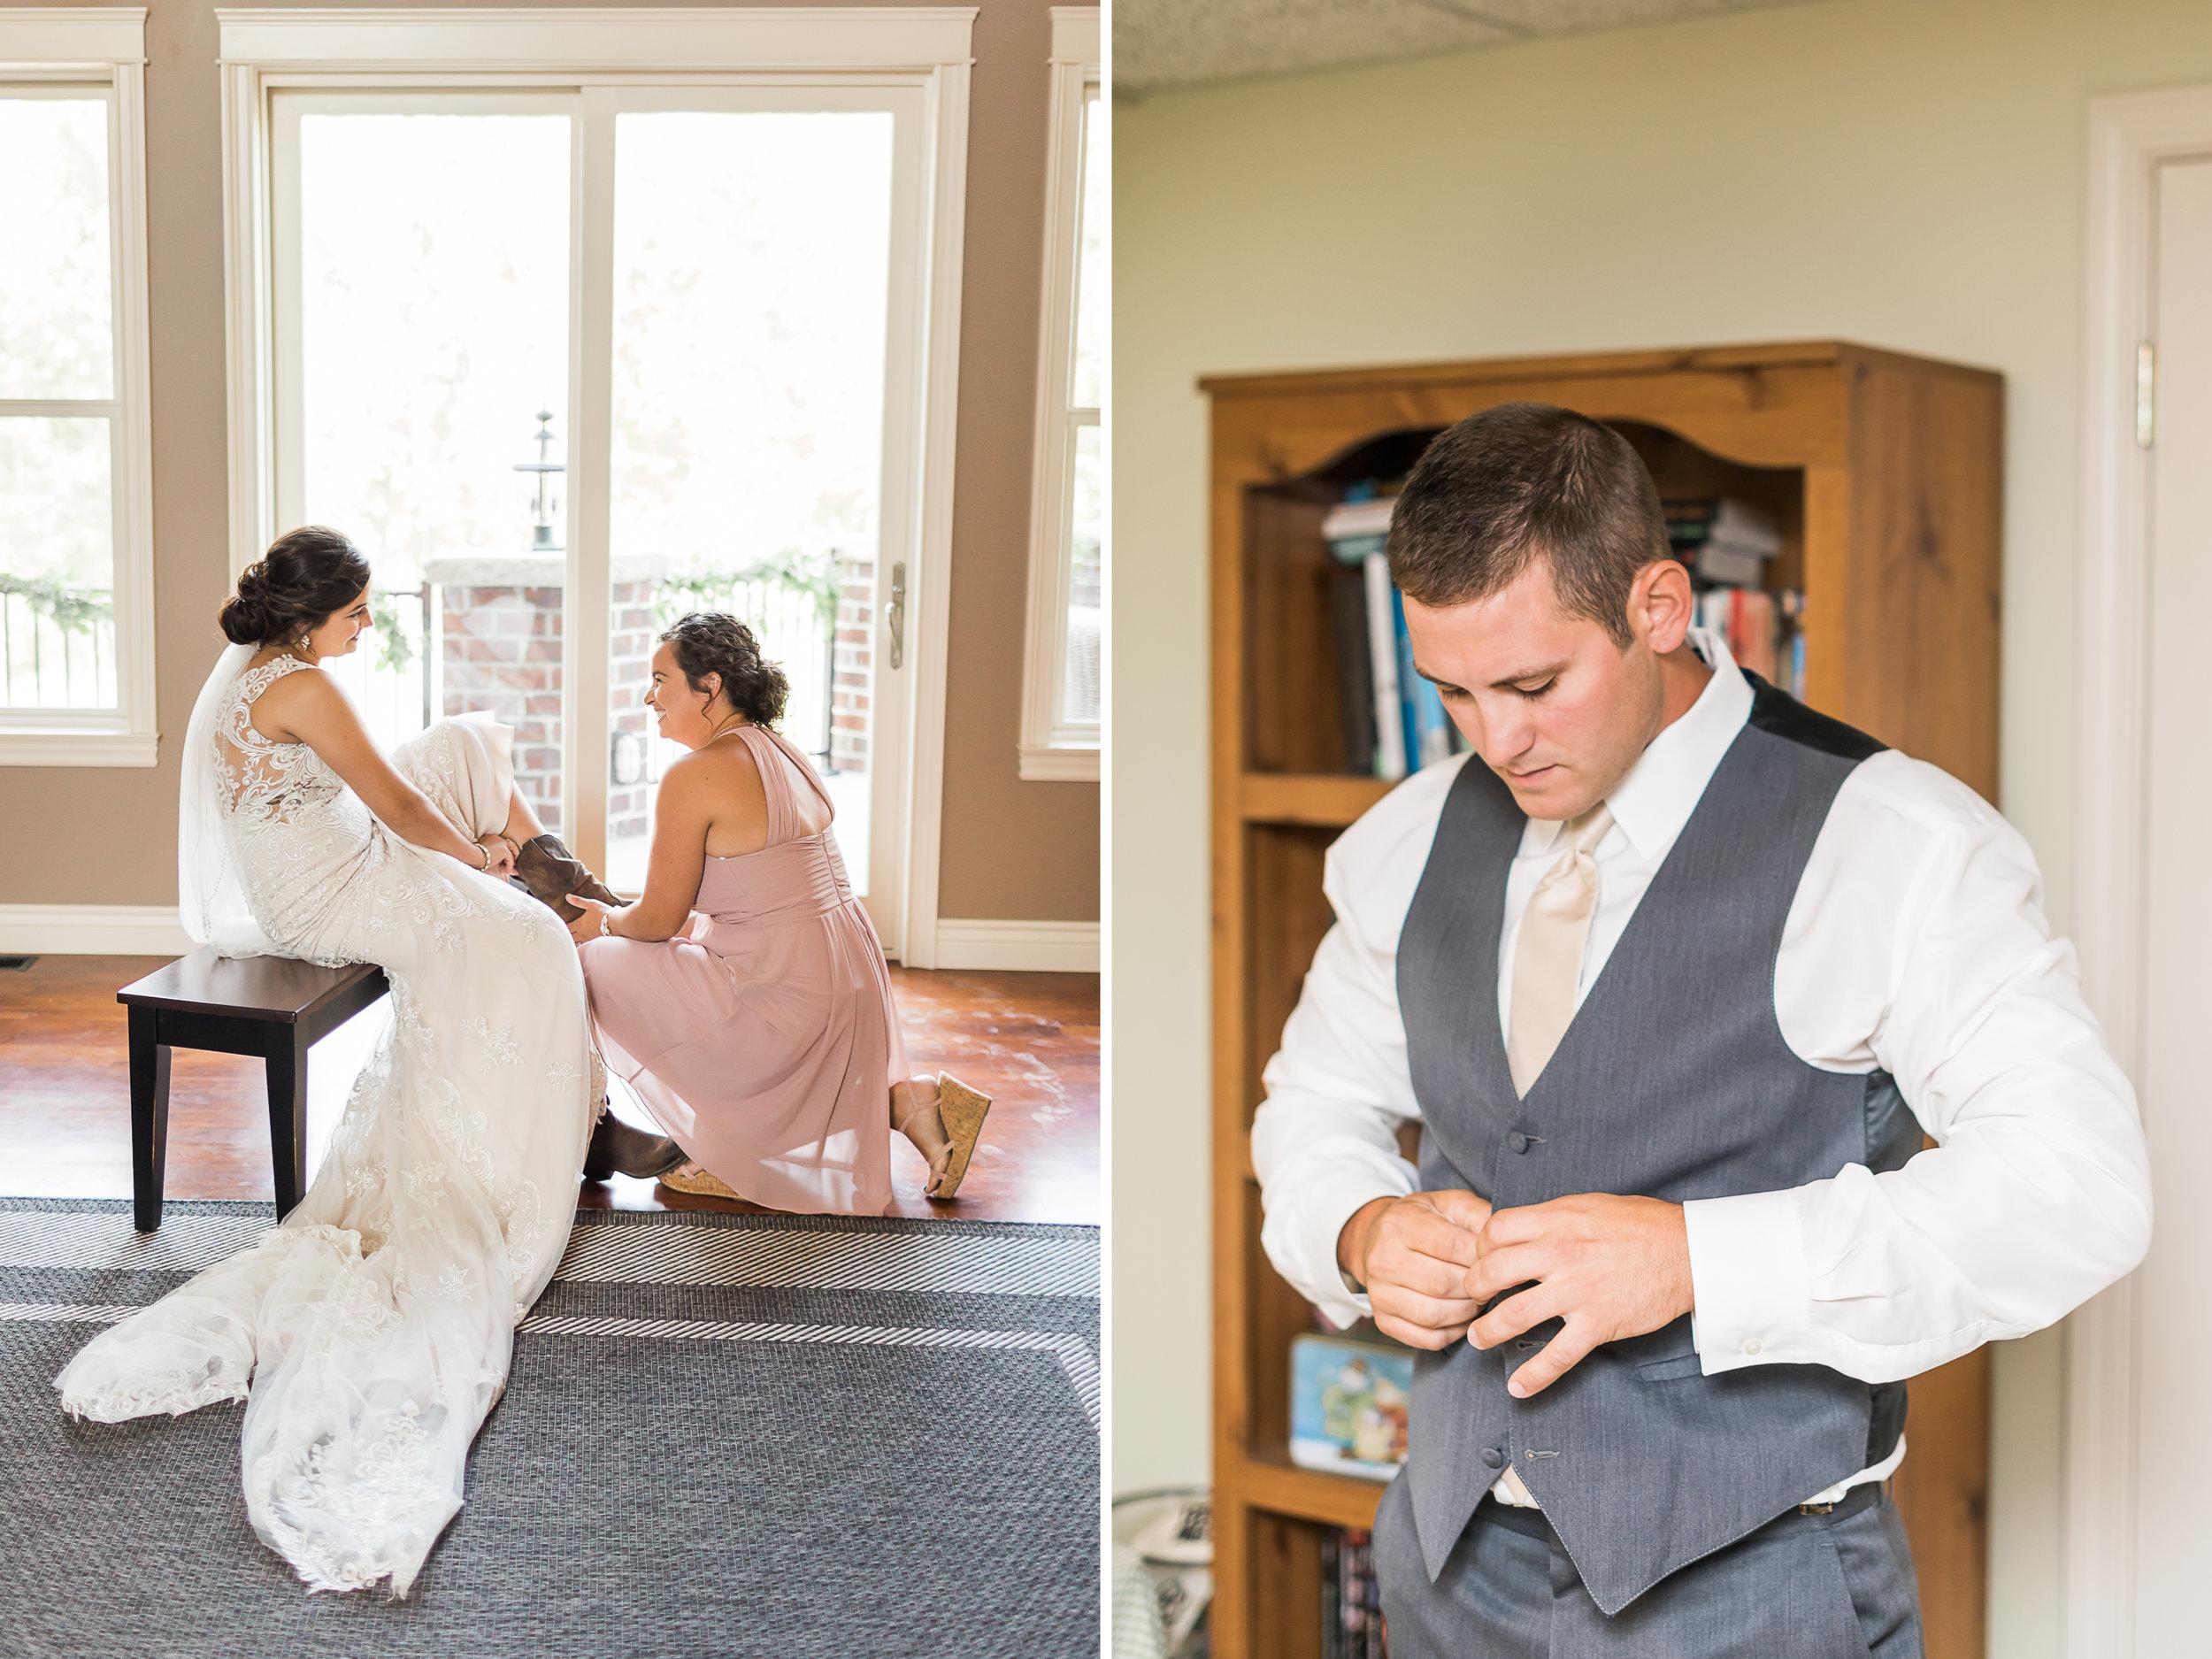 romanticcountrywedding-7.jpg